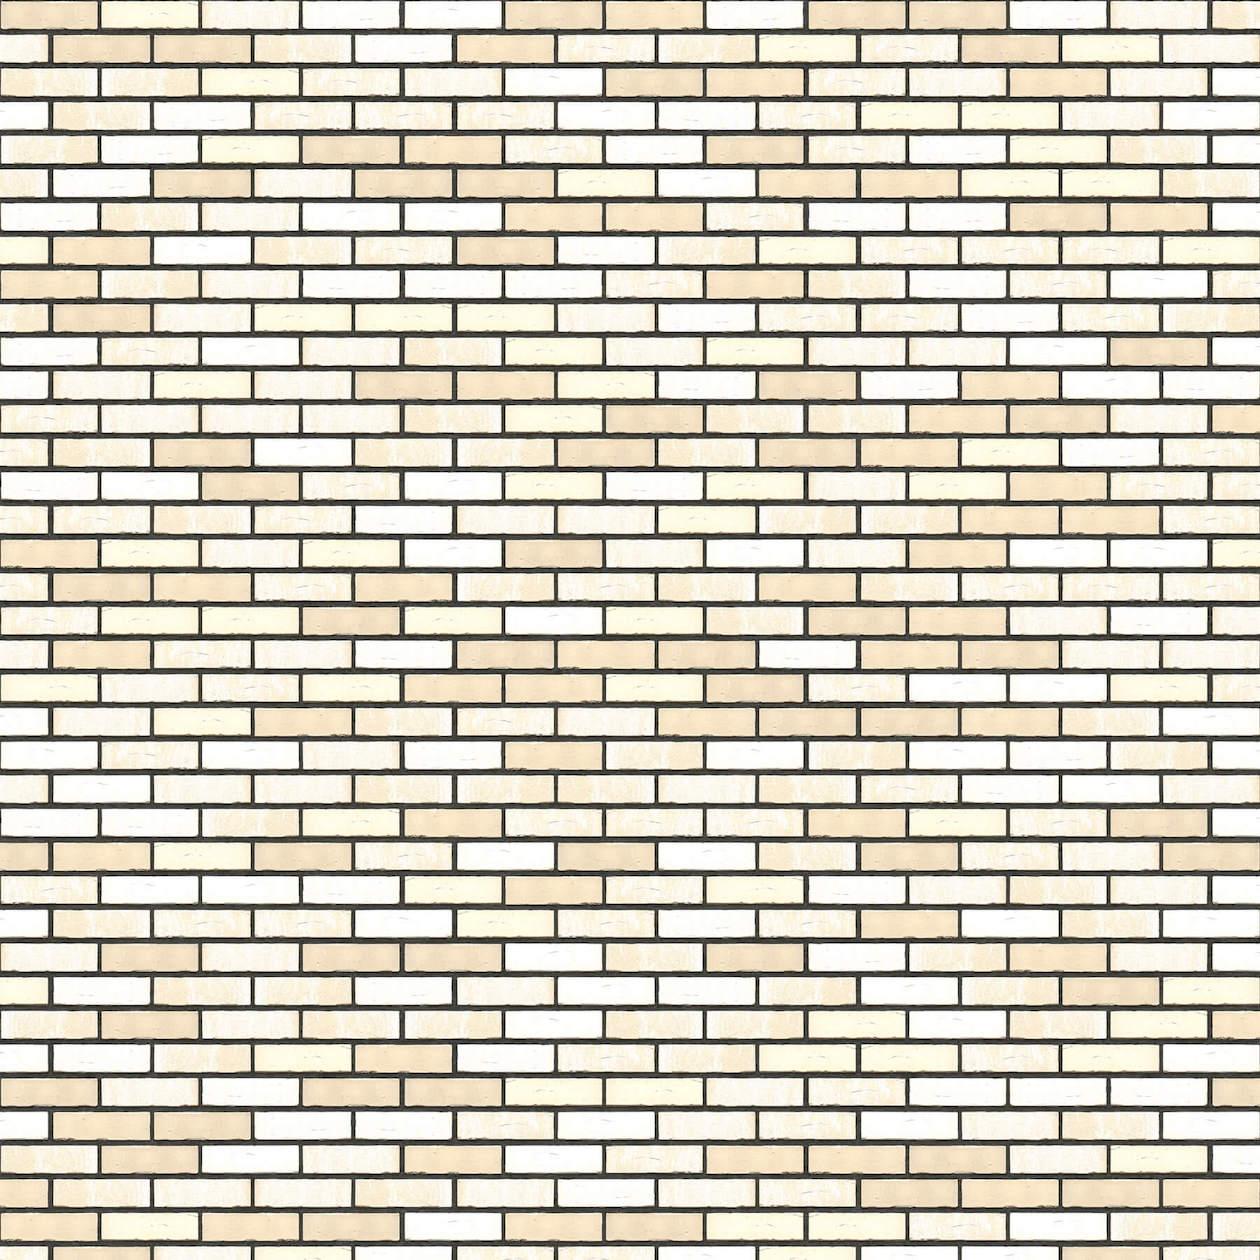 Puna-cigla-FeldHaus-Klinker-brick-house-nf-k-733-Antracit Fuga